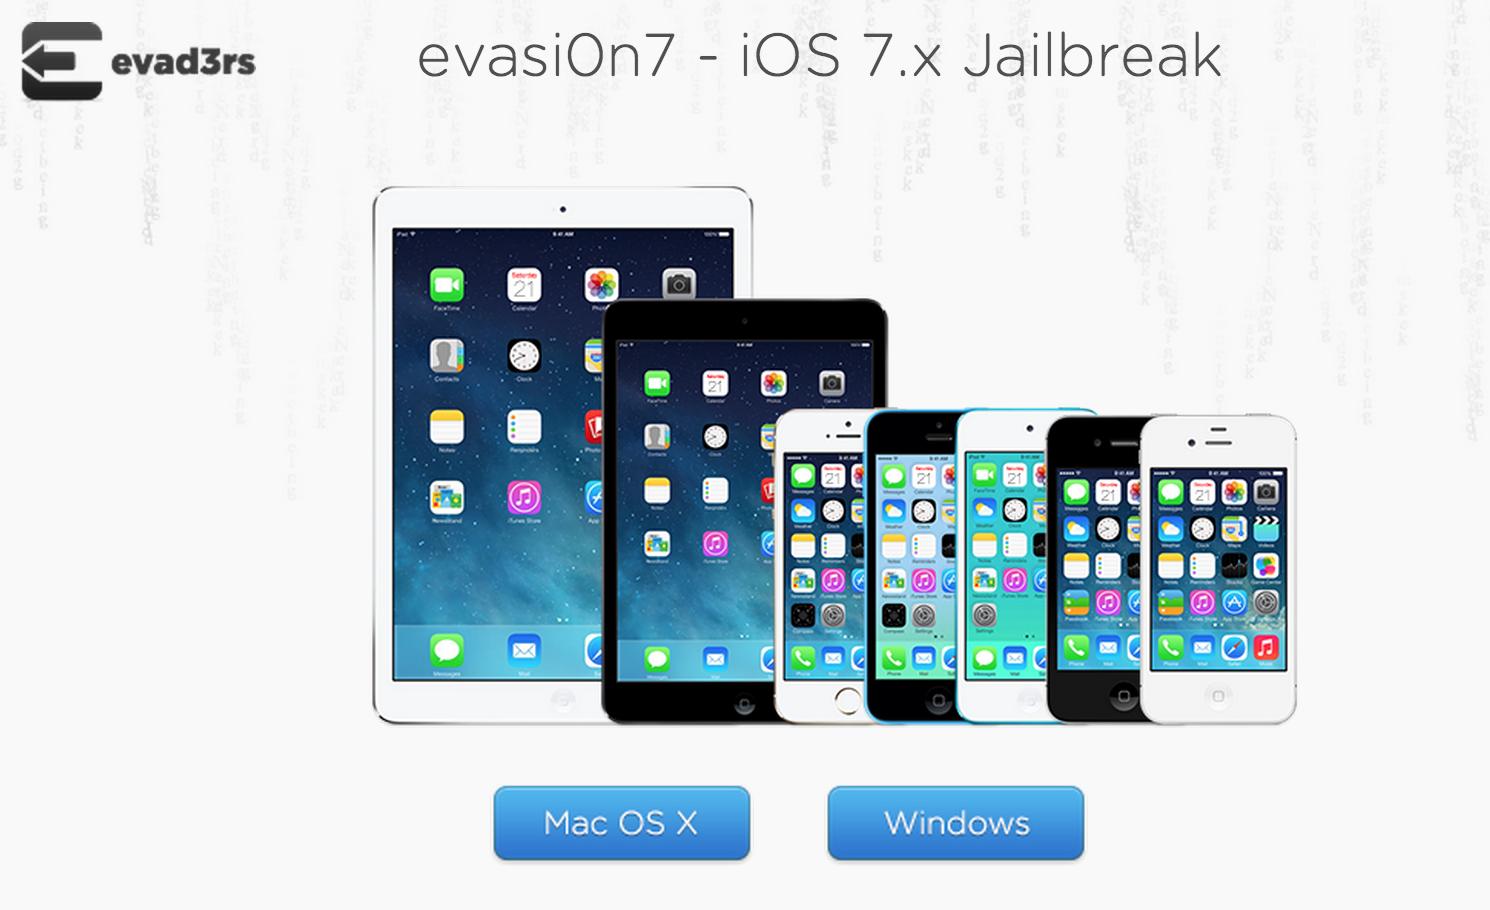 How to jailbreak iOS 7 using evasi0n7 Windows tutorial